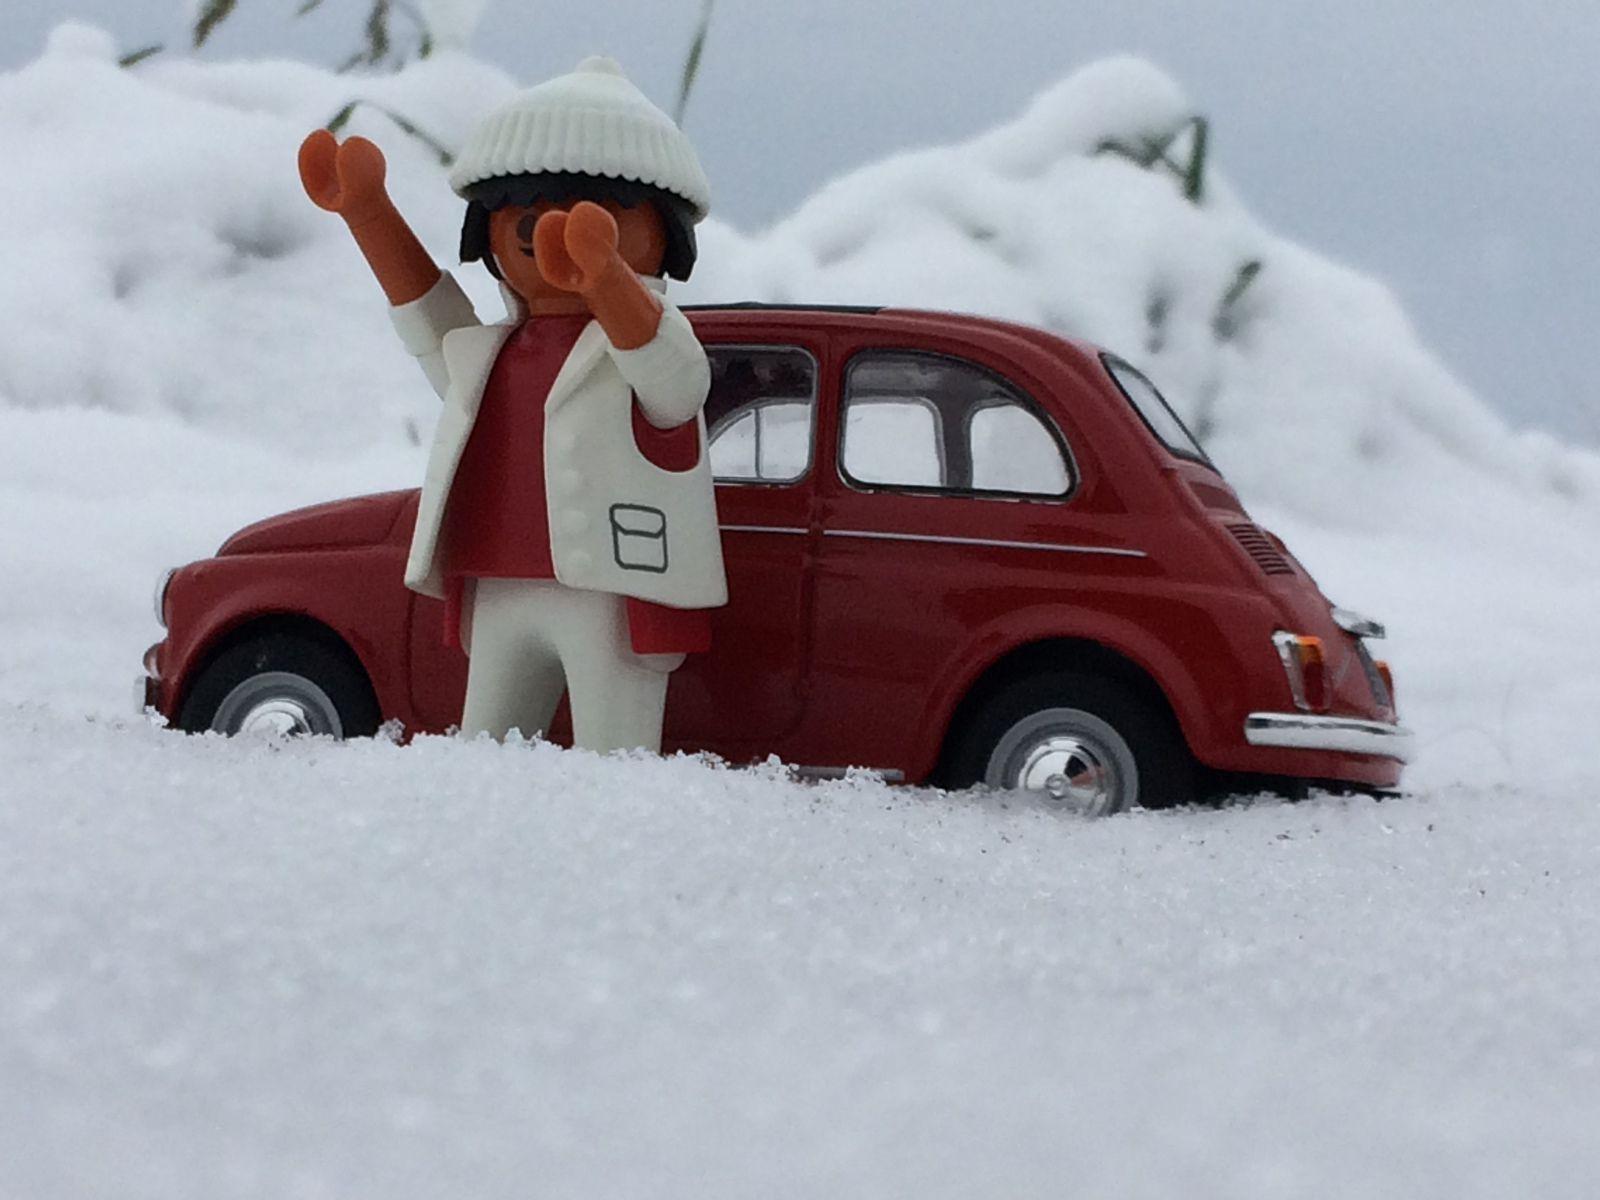 Tonio di Napoli n'aime pas la neige